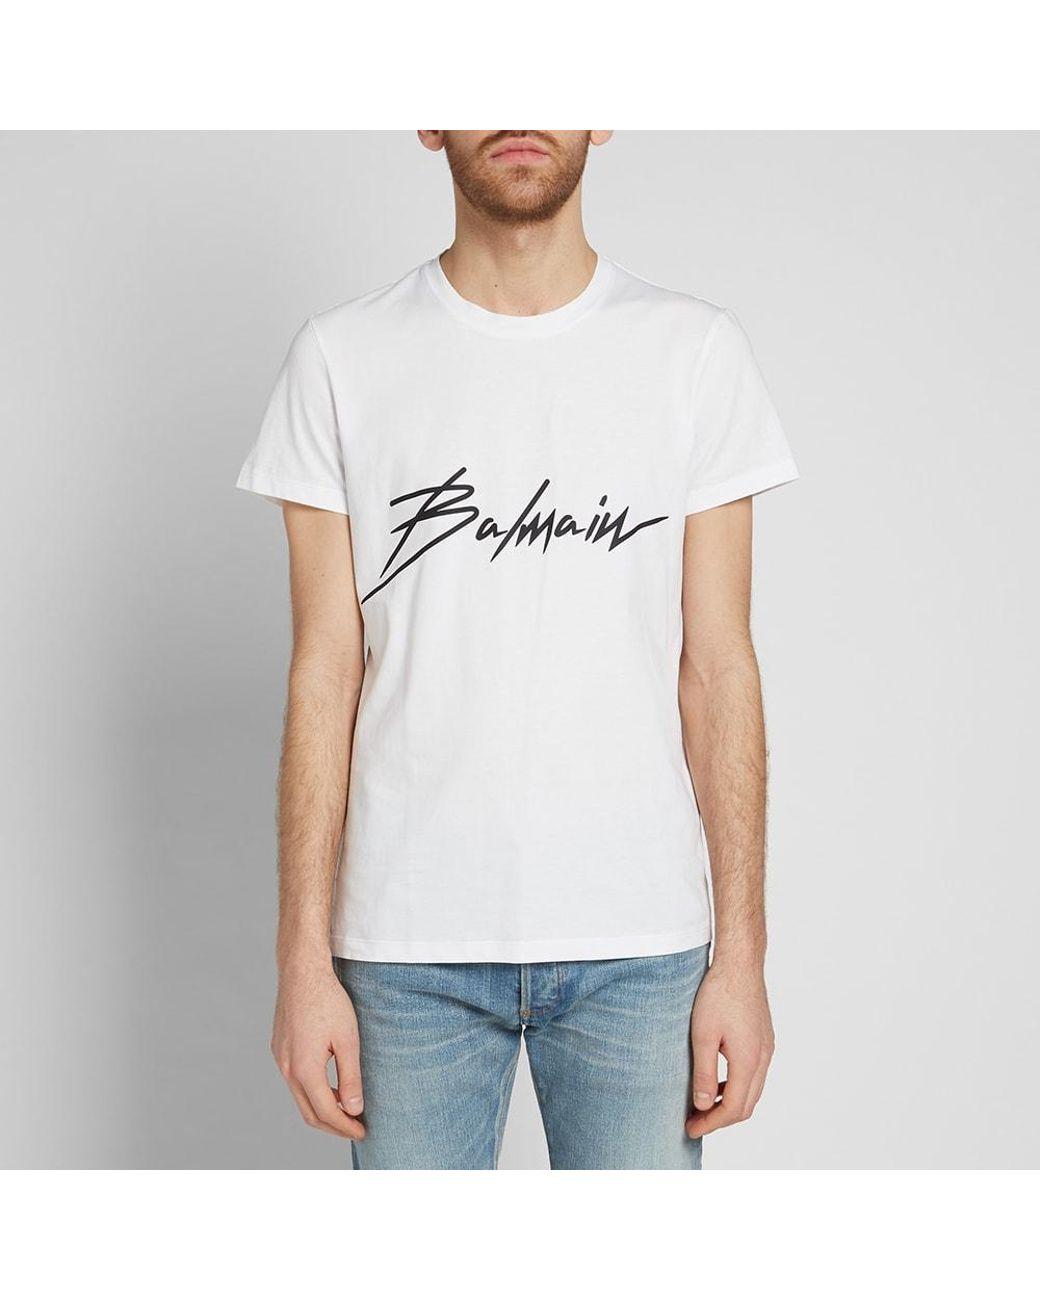 ce0b5ff1 Balmain Signature Logo Tee in White for Men - Lyst